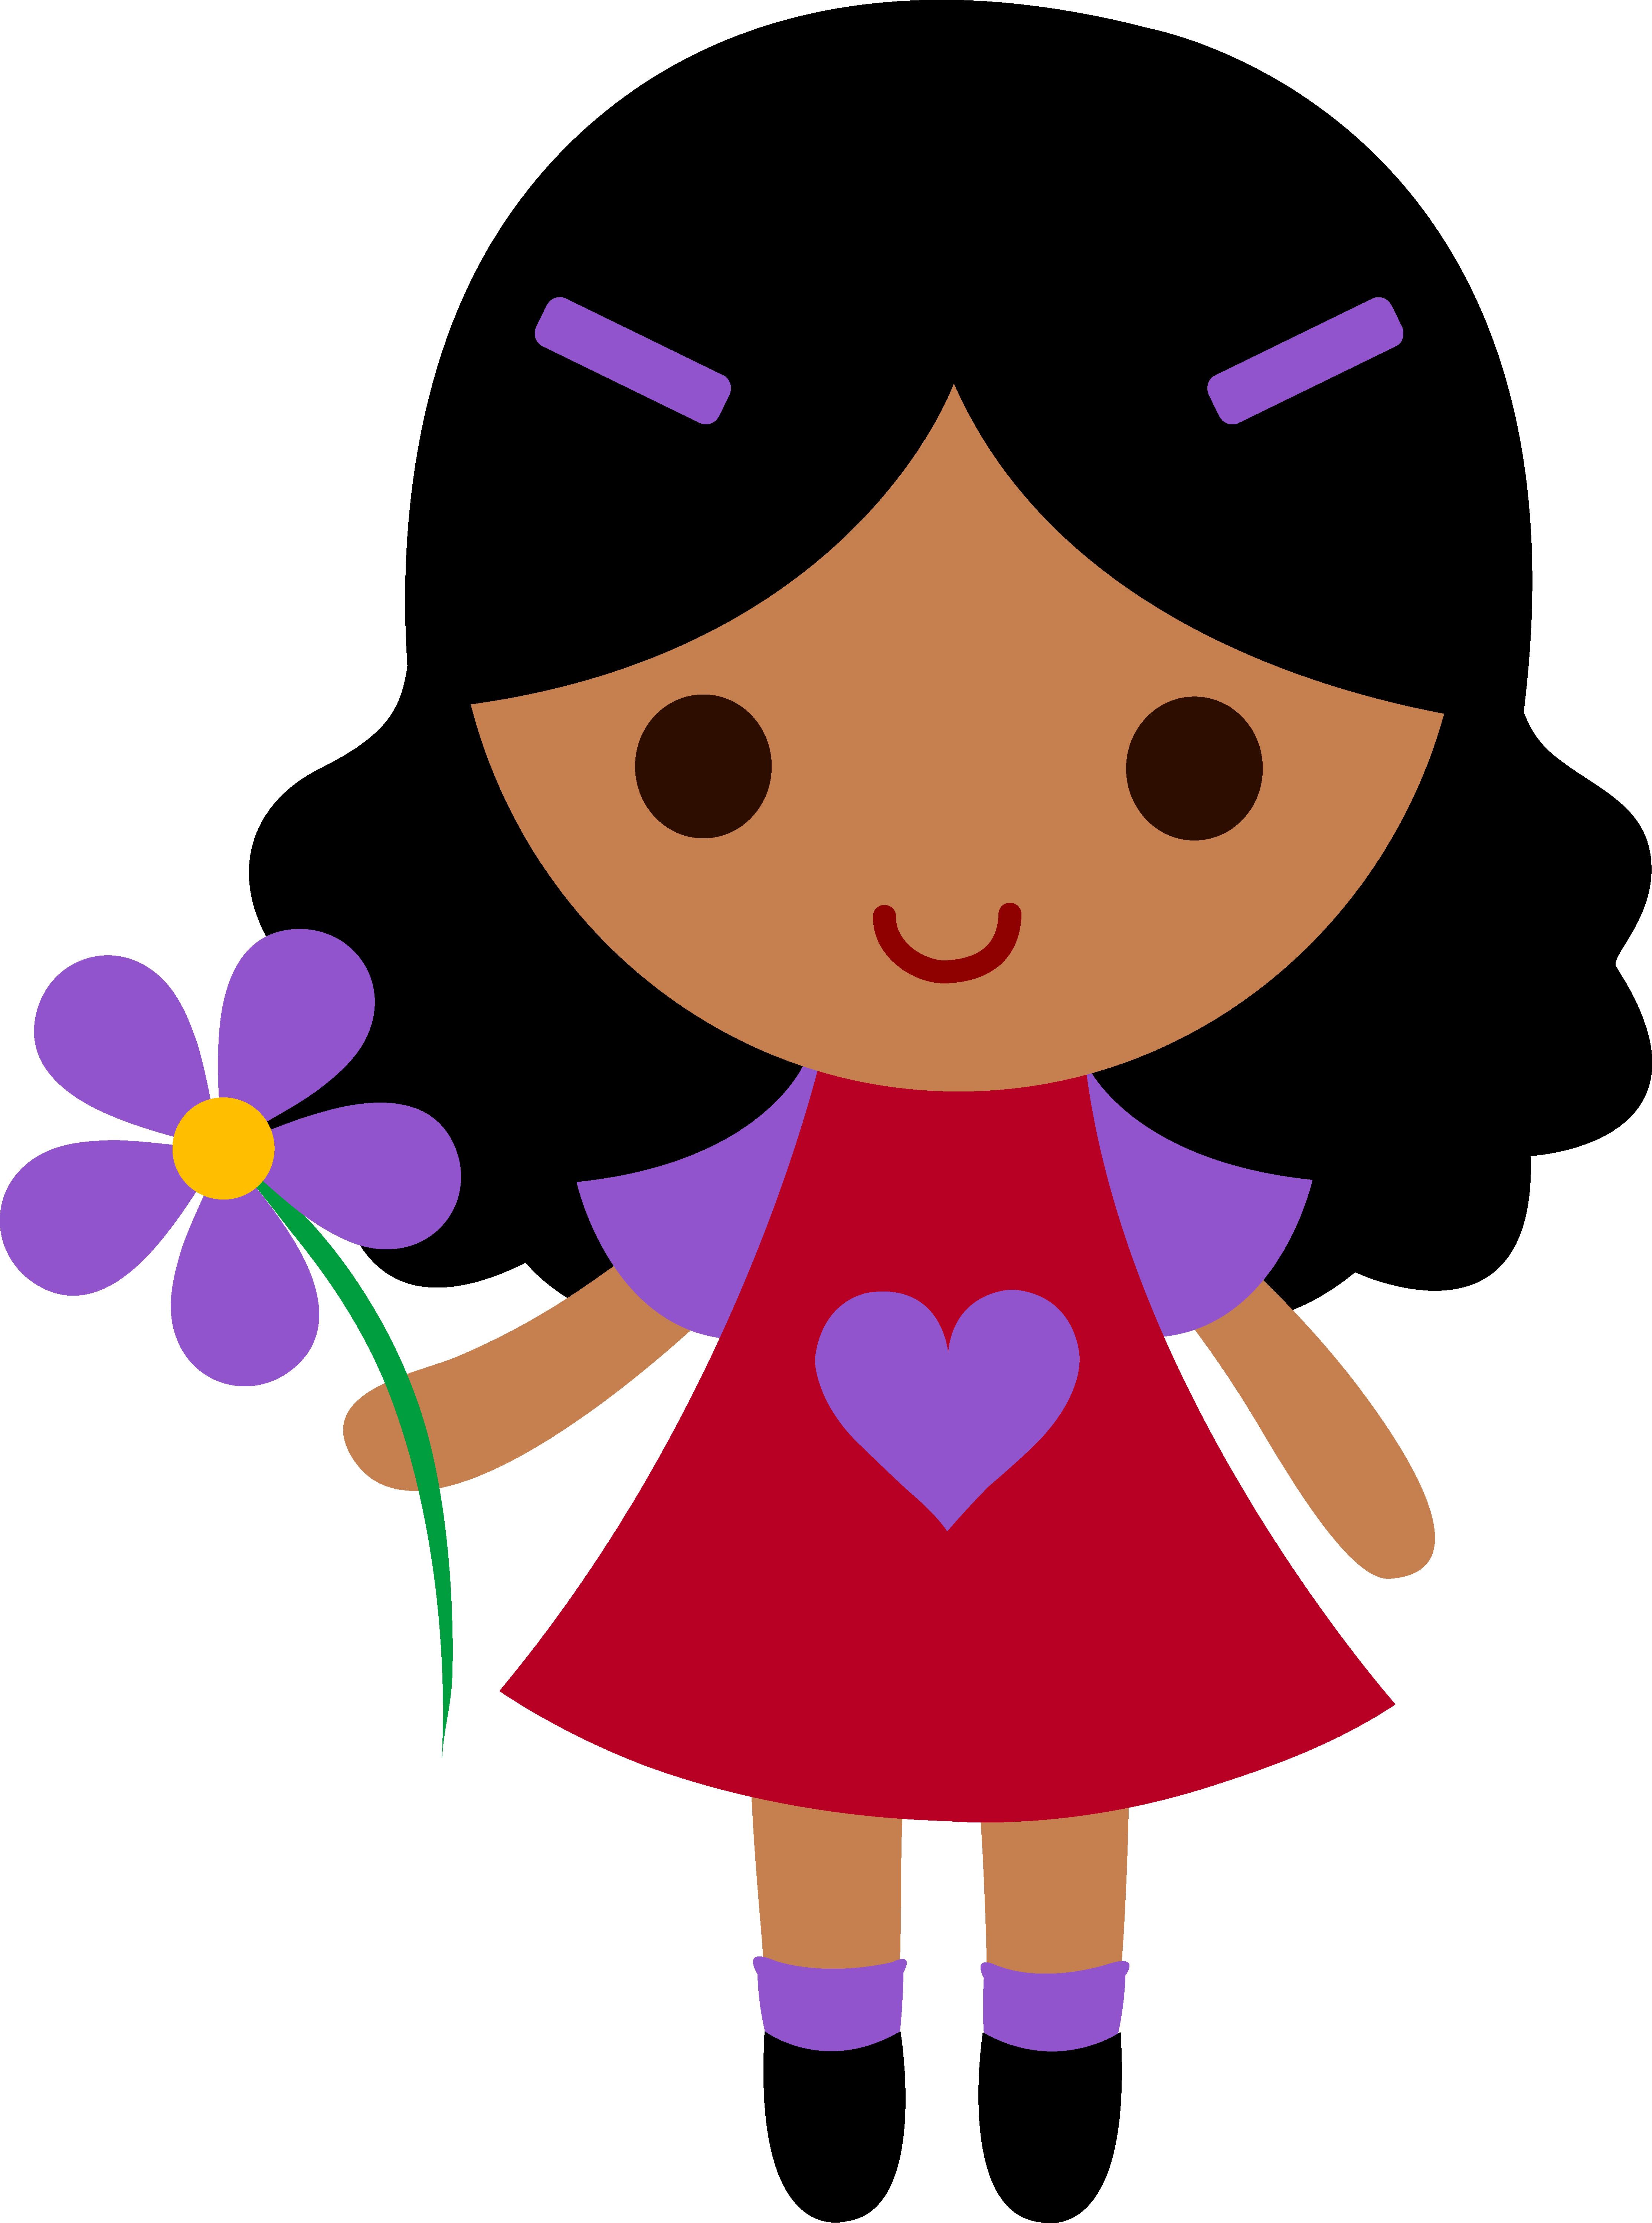 4451x5988 Little Girl Cartoon Drawing My Cliprt Of Little Girl Holding